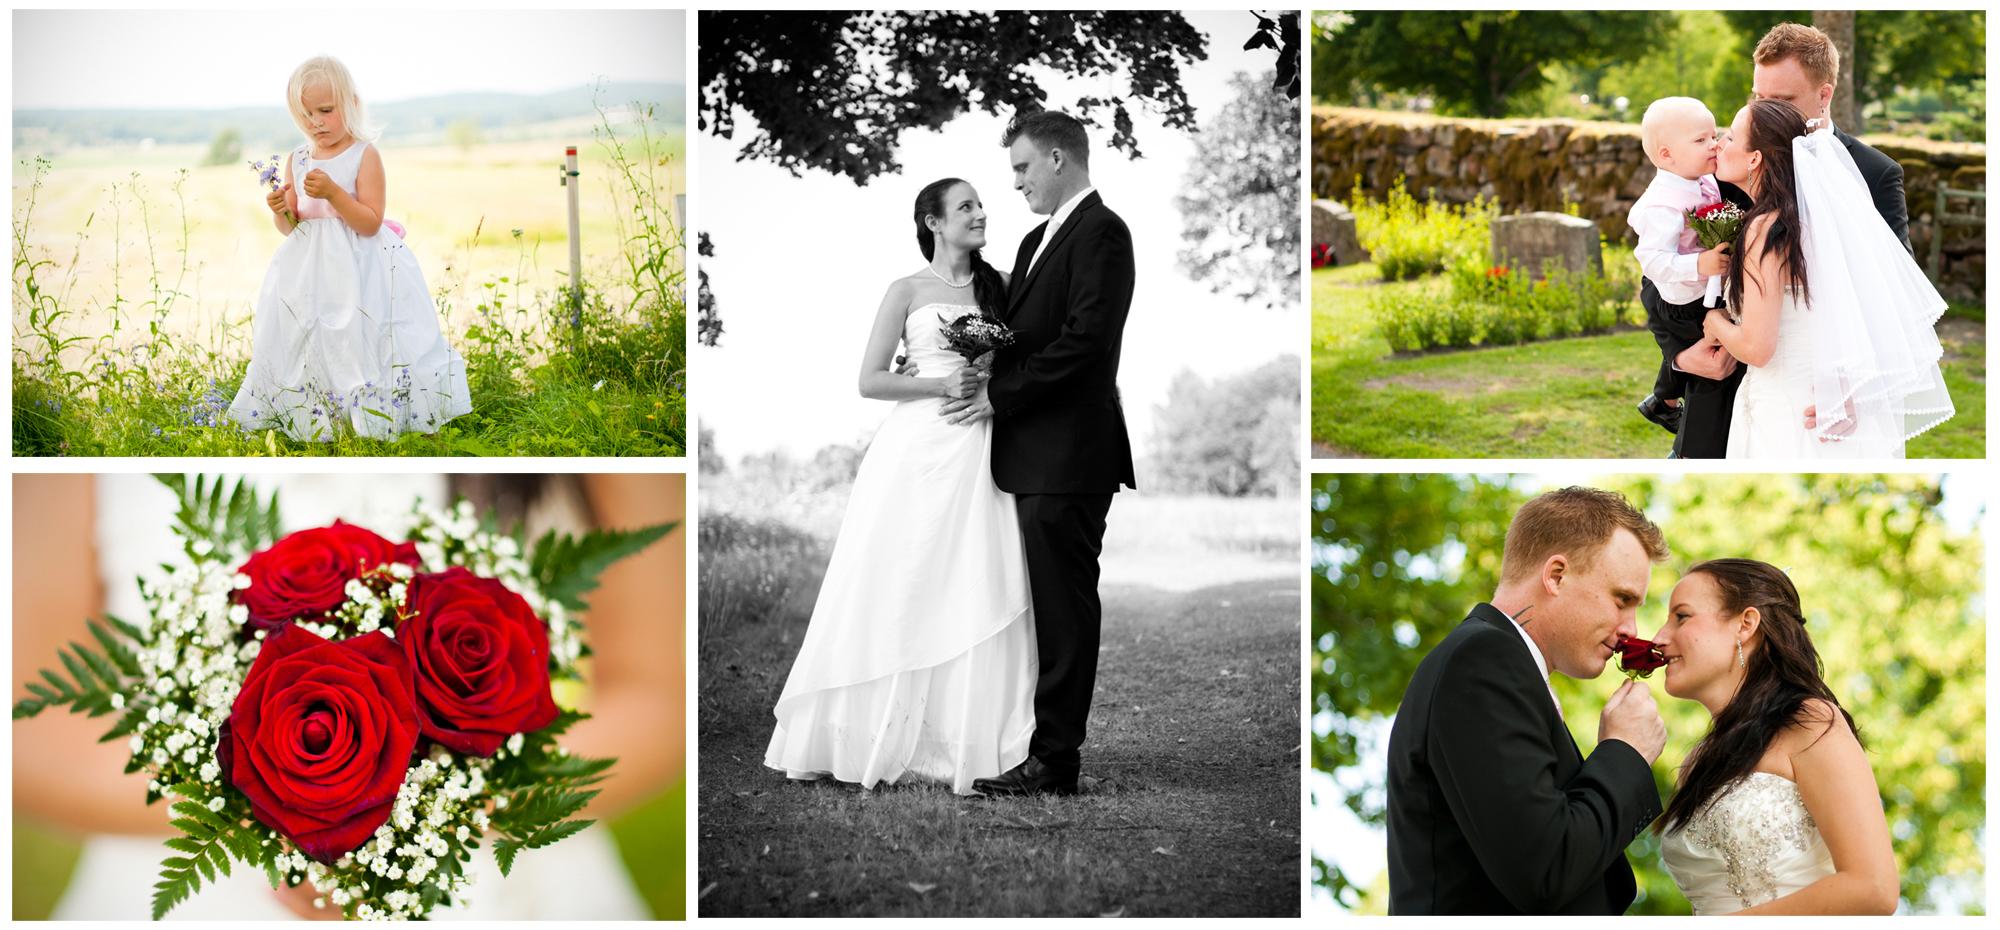 Bröllopsfotograferingar under sommaren